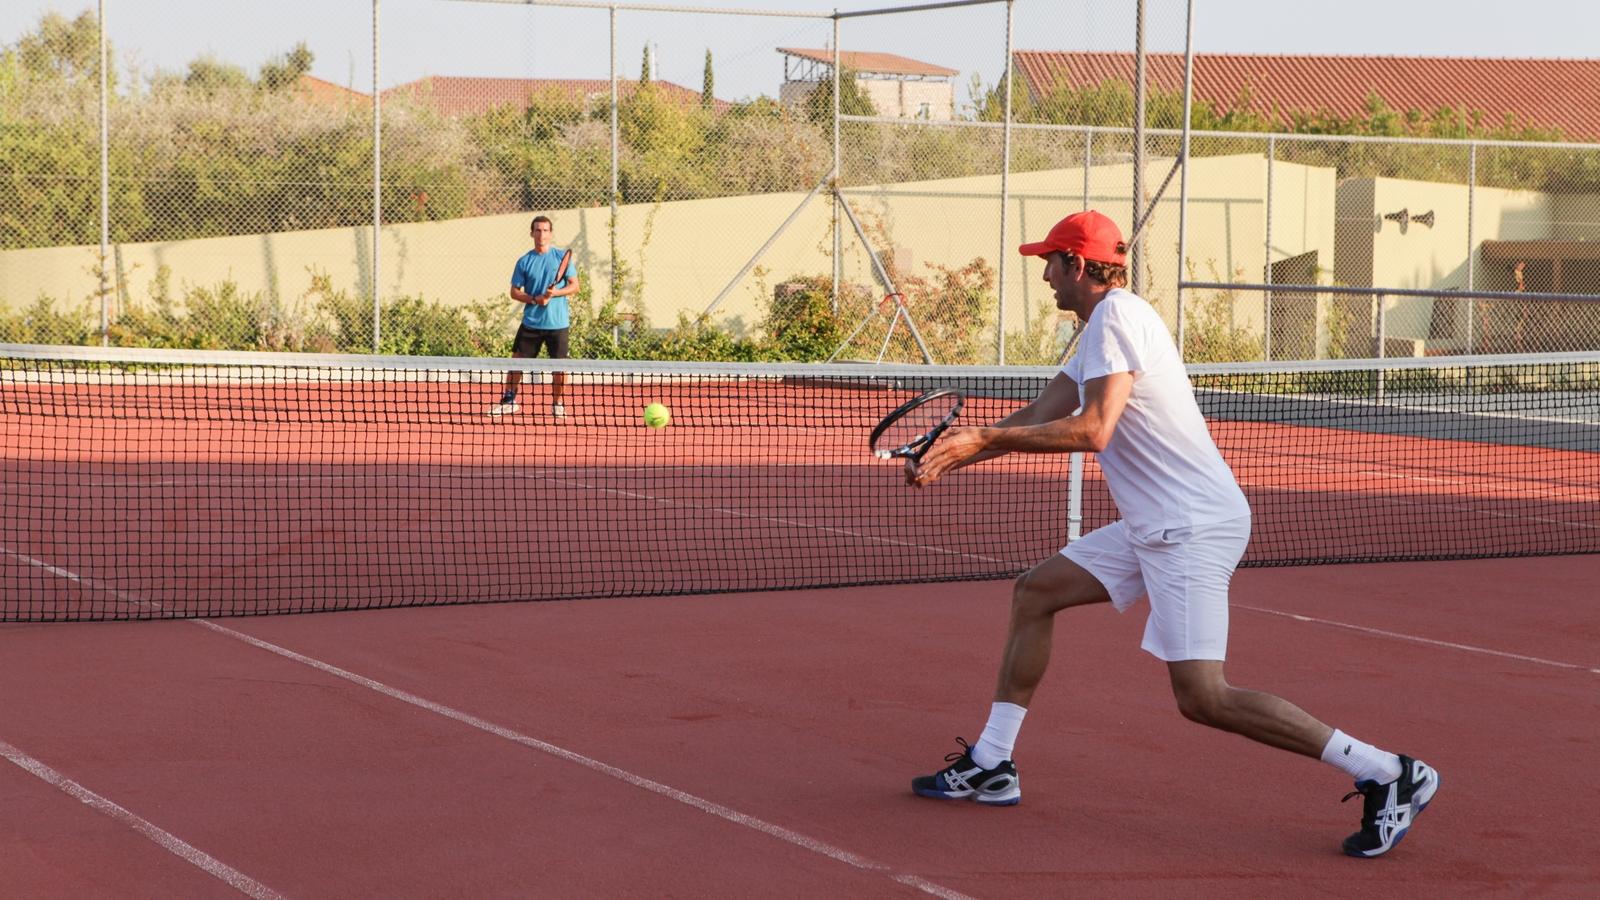 Costa Navarino Greece  city photos gallery : Tennis Coach for Costa Navarino, Pylos, Greece Hotelandtennis.com